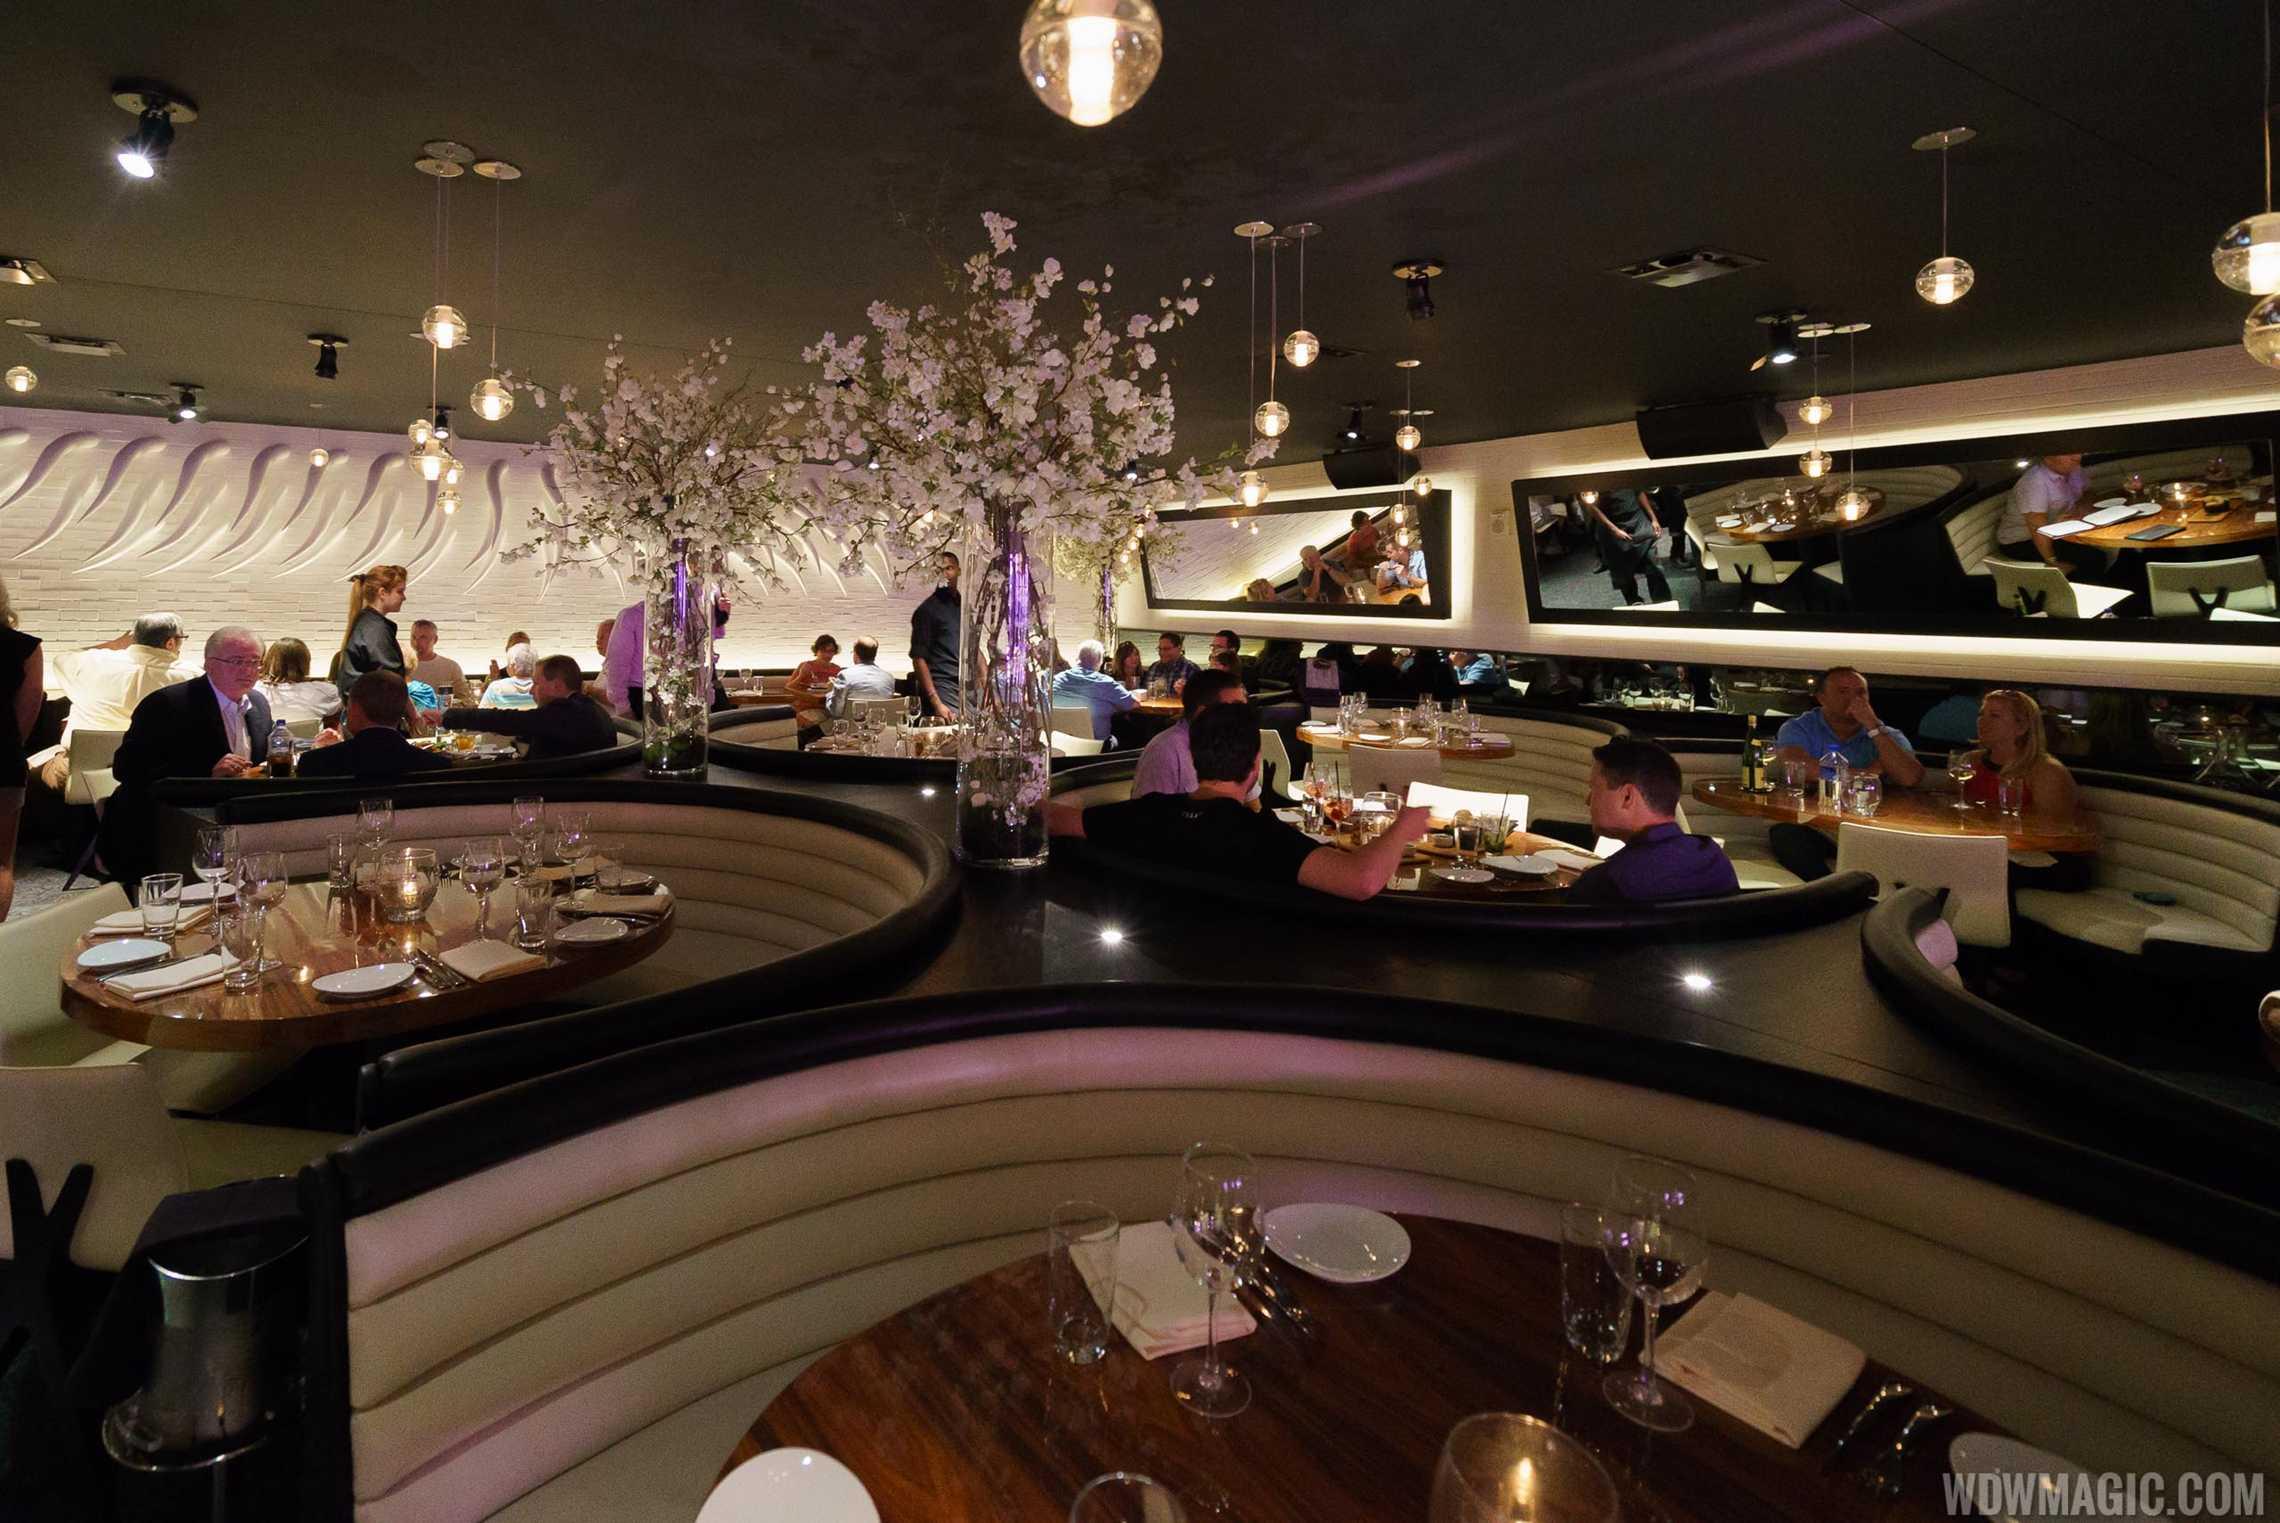 STK Orlando - Lower level main dining room